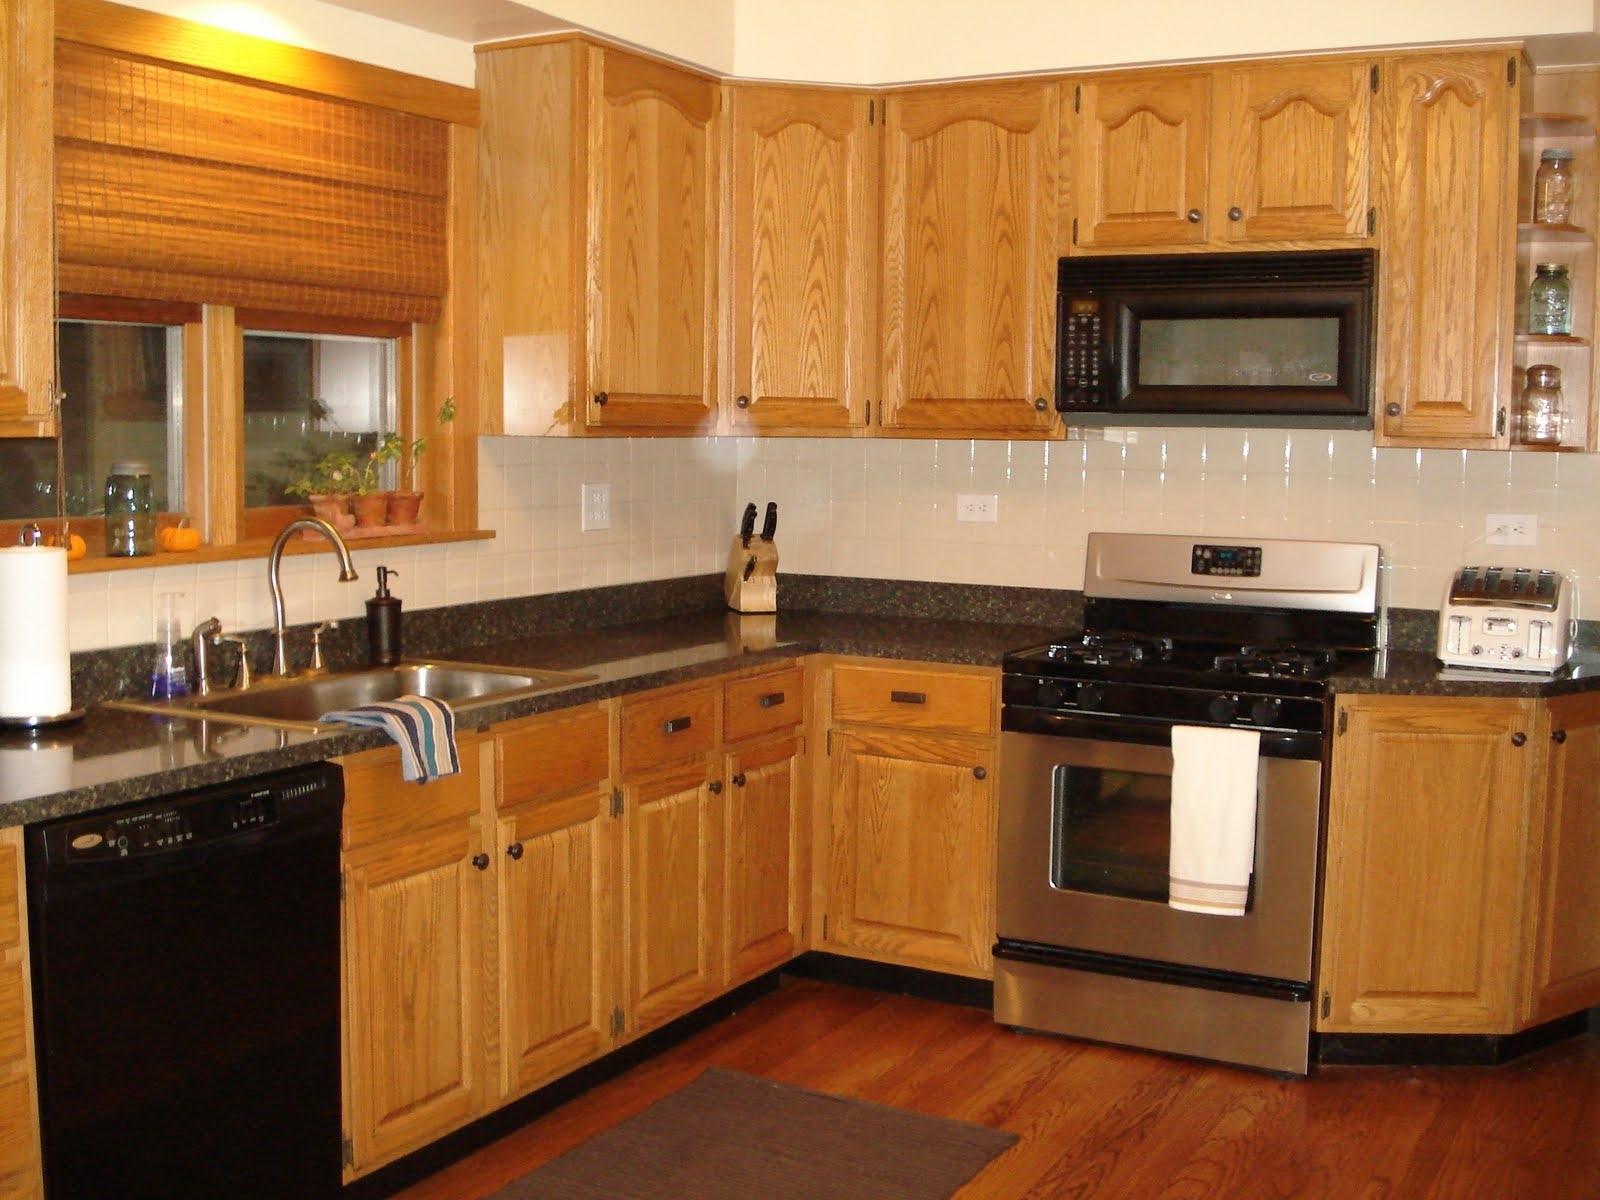 Oak Cupboards Inside Widely Used Oak Kitchen Cabinets Flooring – Oak Kitchen Cabinets Ideas And (View 10 of 15)